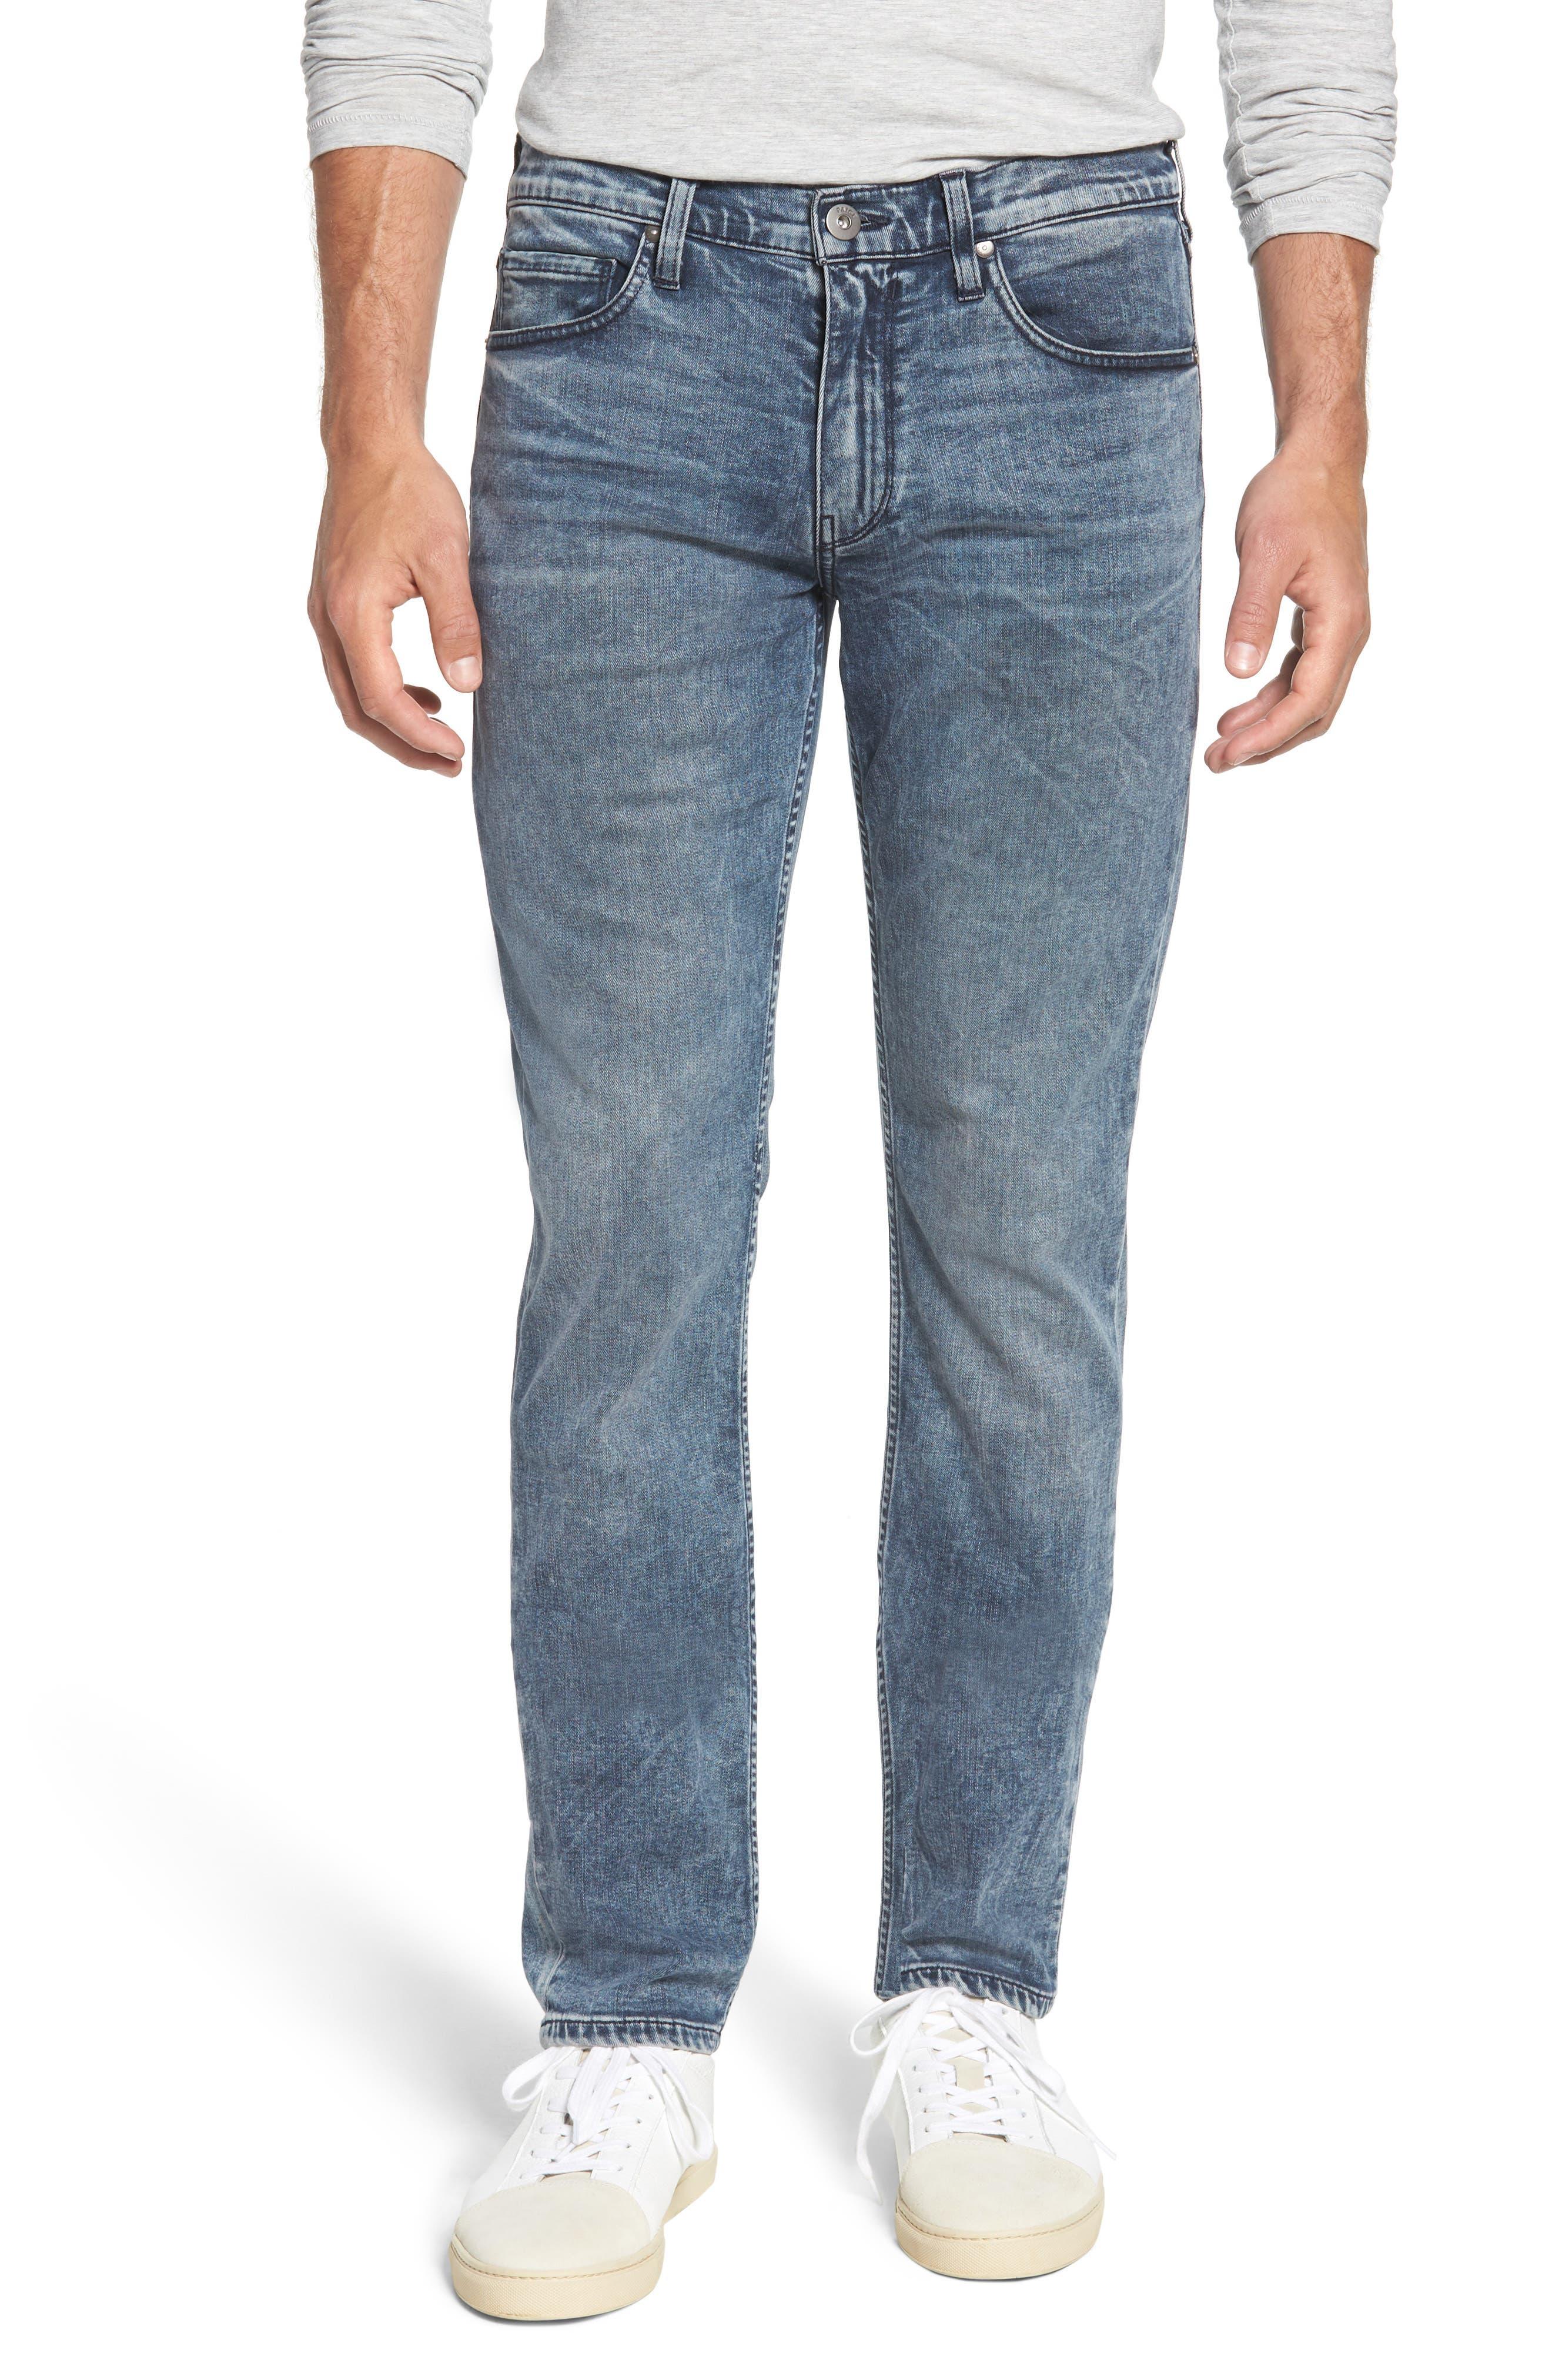 Transcend - Lennox Slim Fit Jeans,                         Main,                         color, Higgs